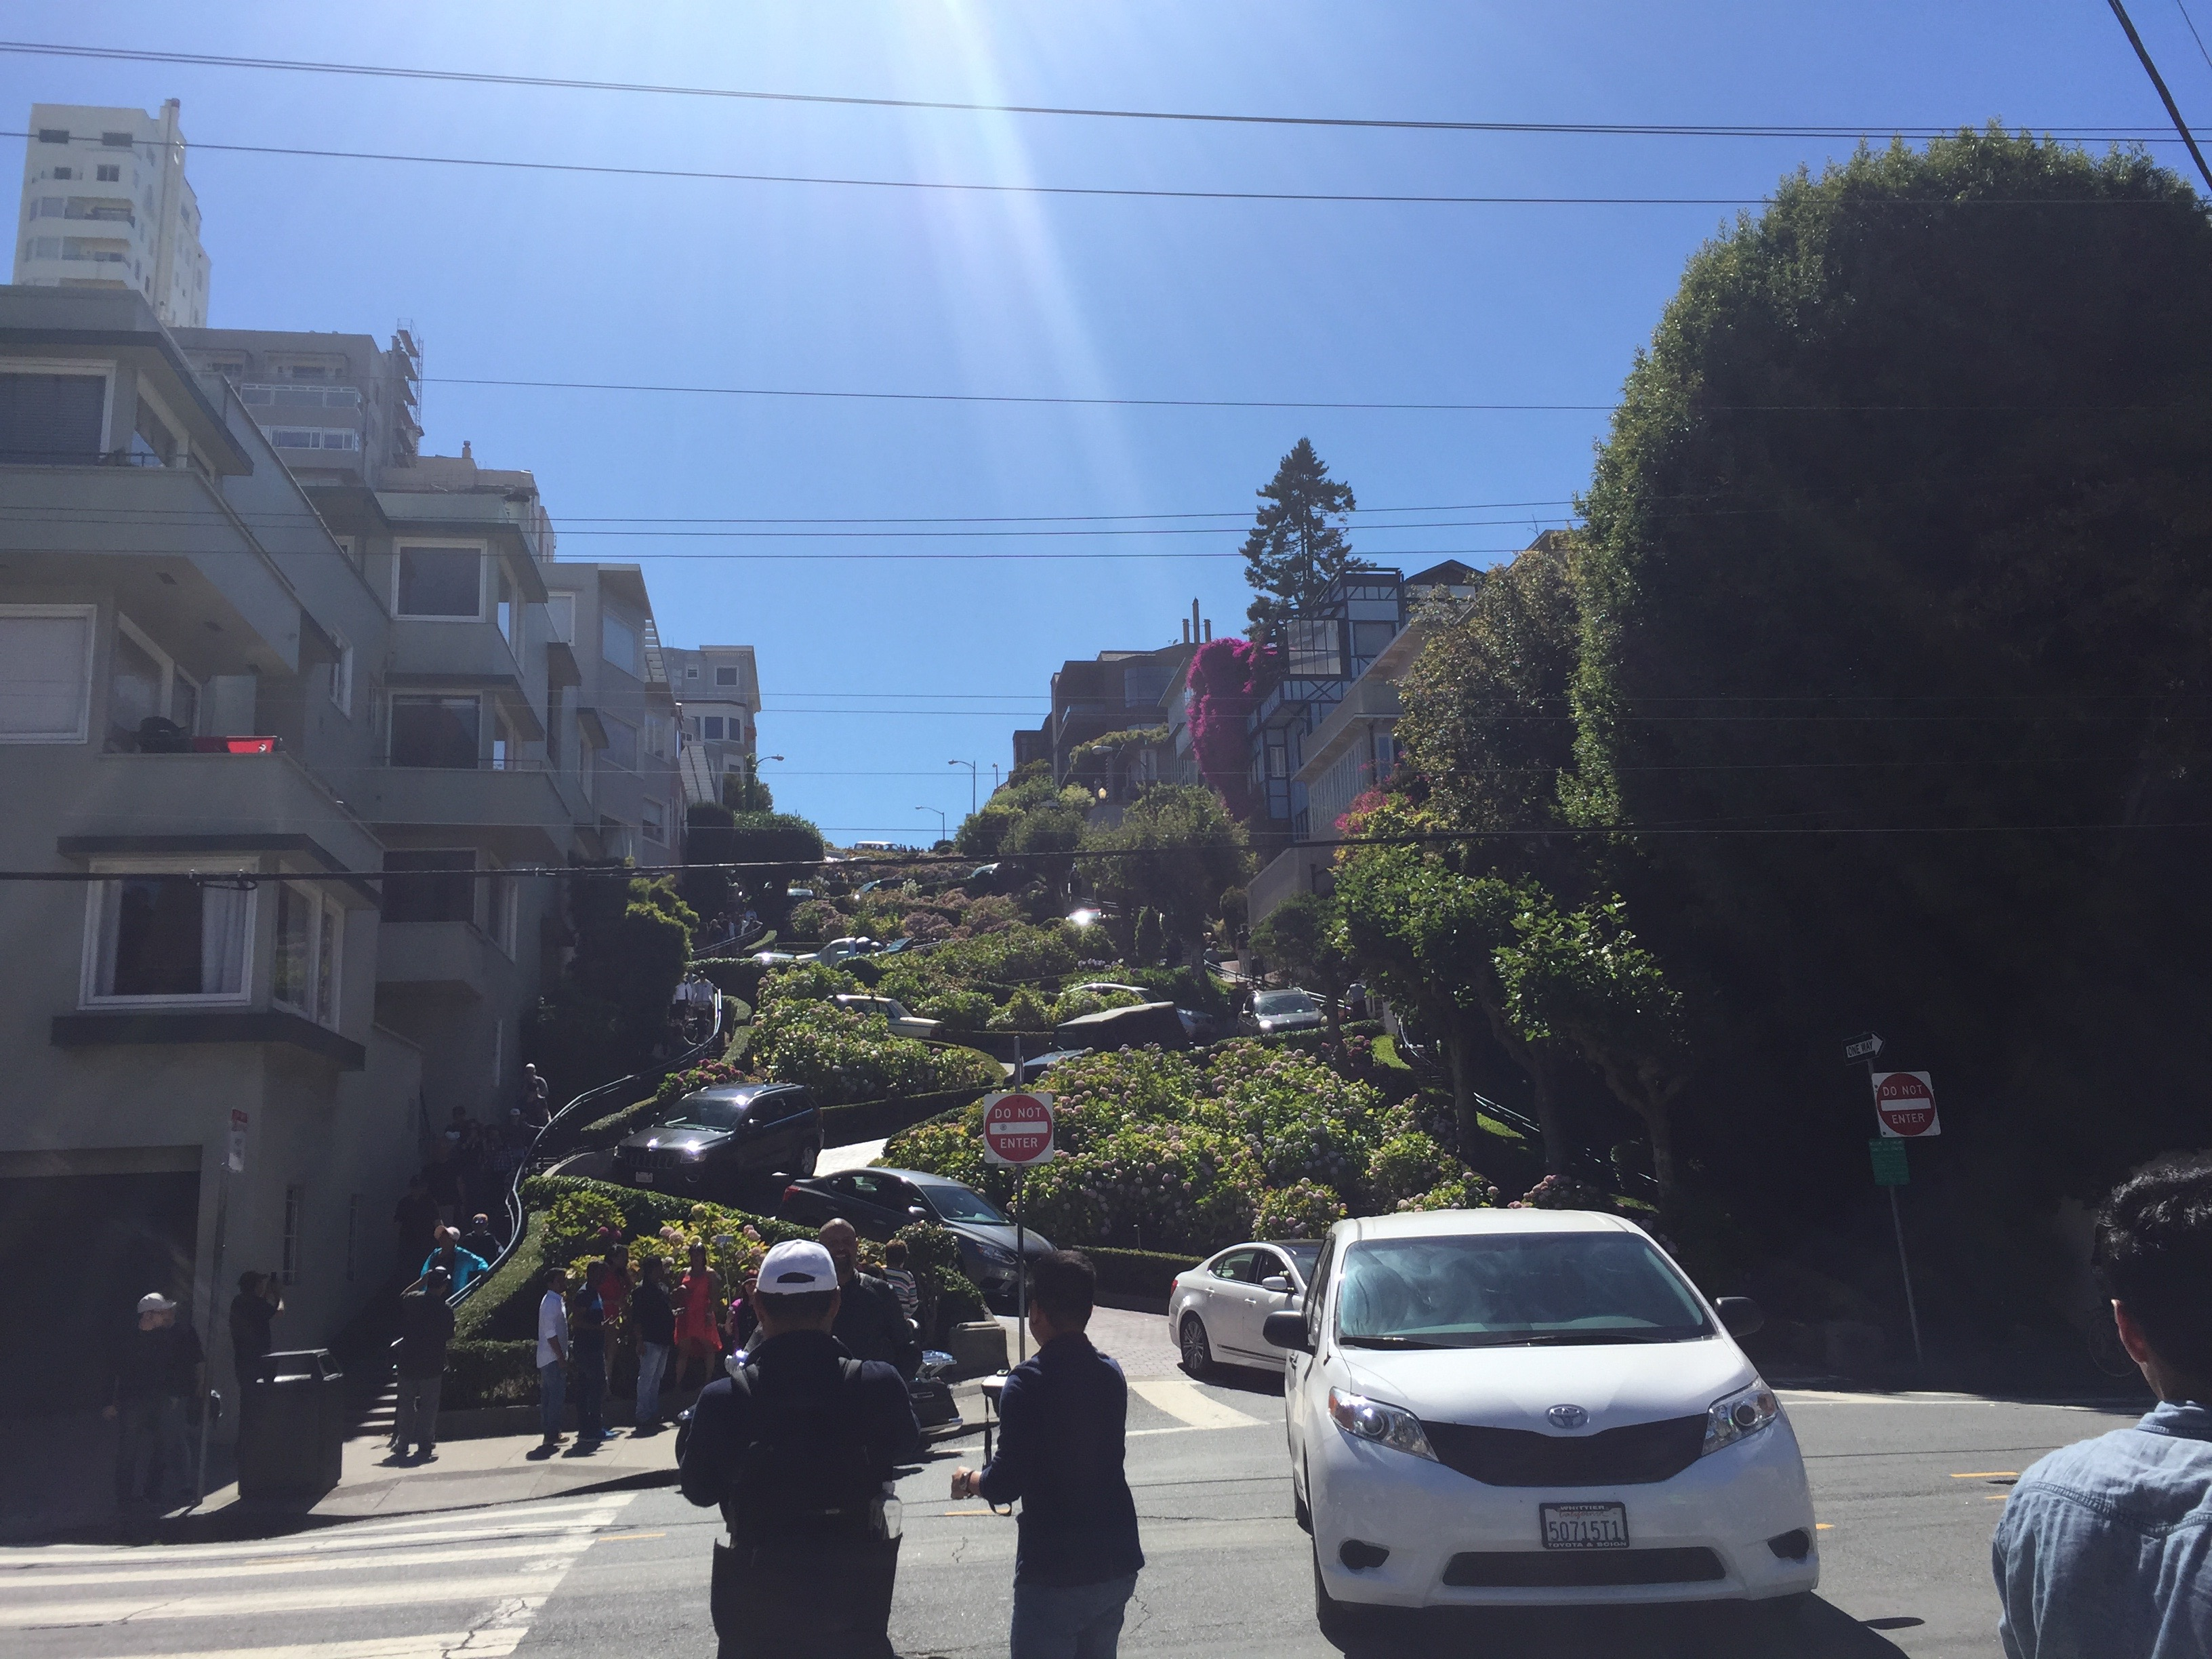 Lombard street traffic in San Francisco.